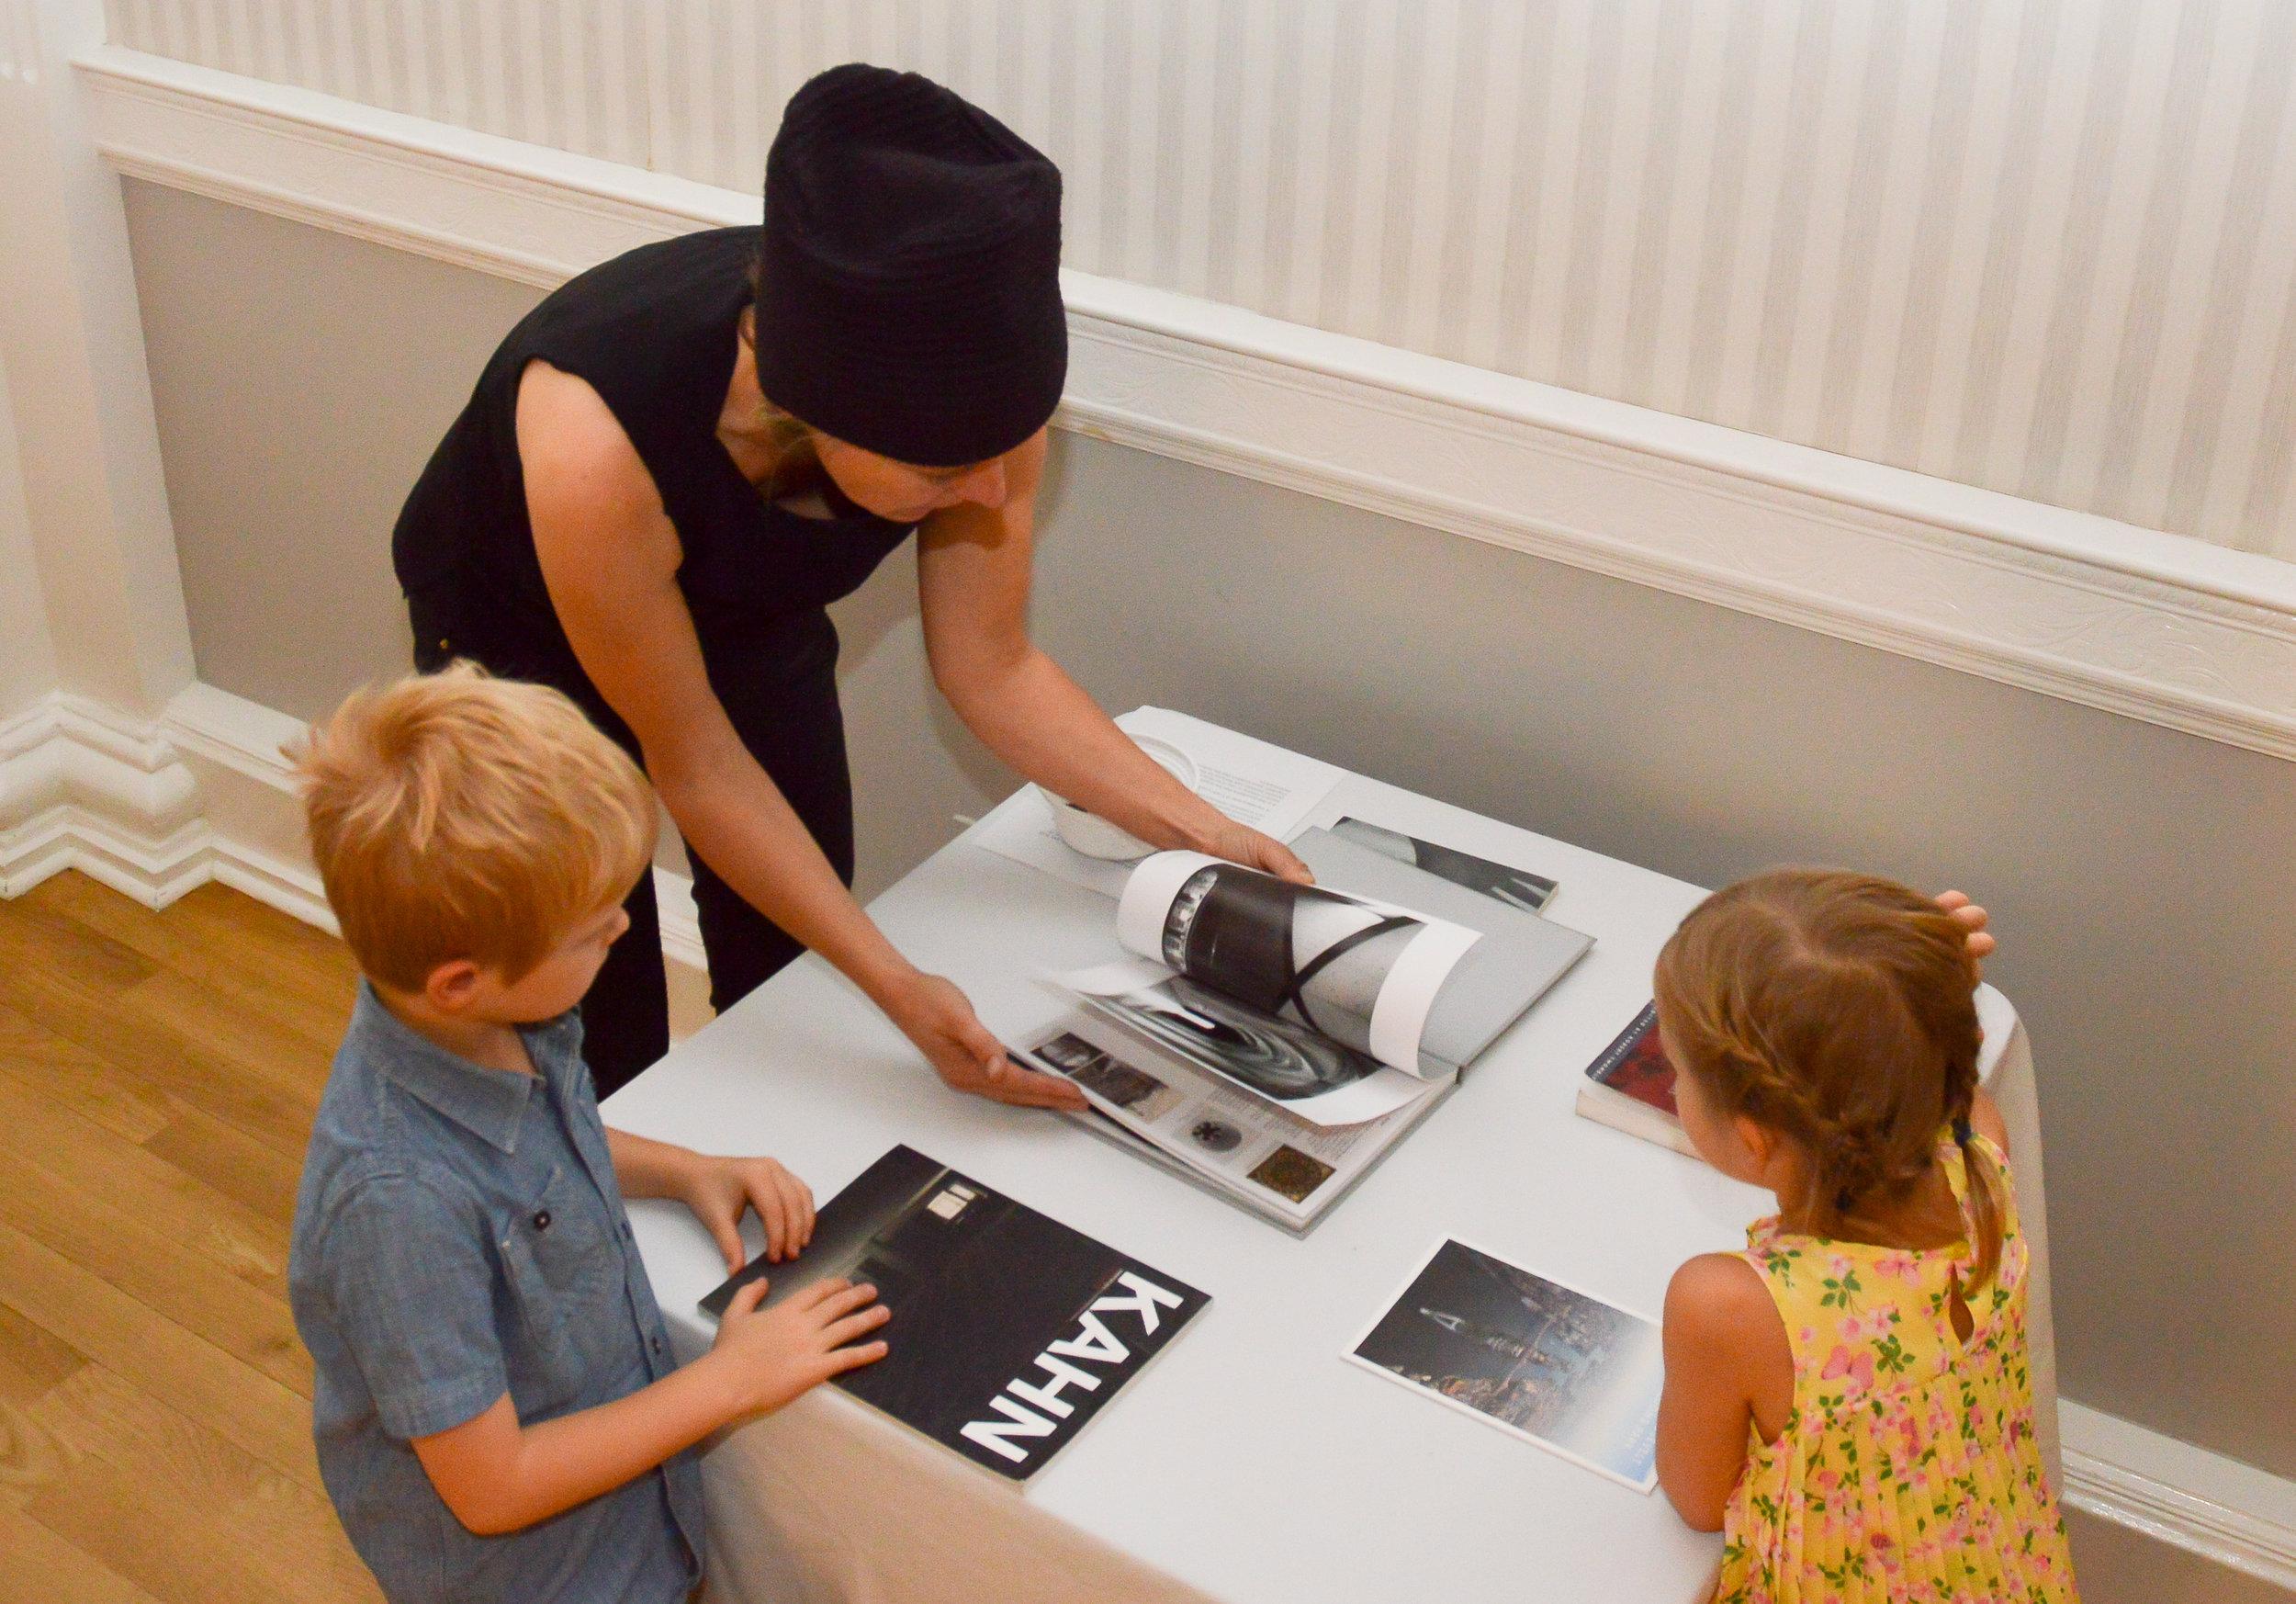 Artist Jaanika Peerna exploring book about Louis Kahn